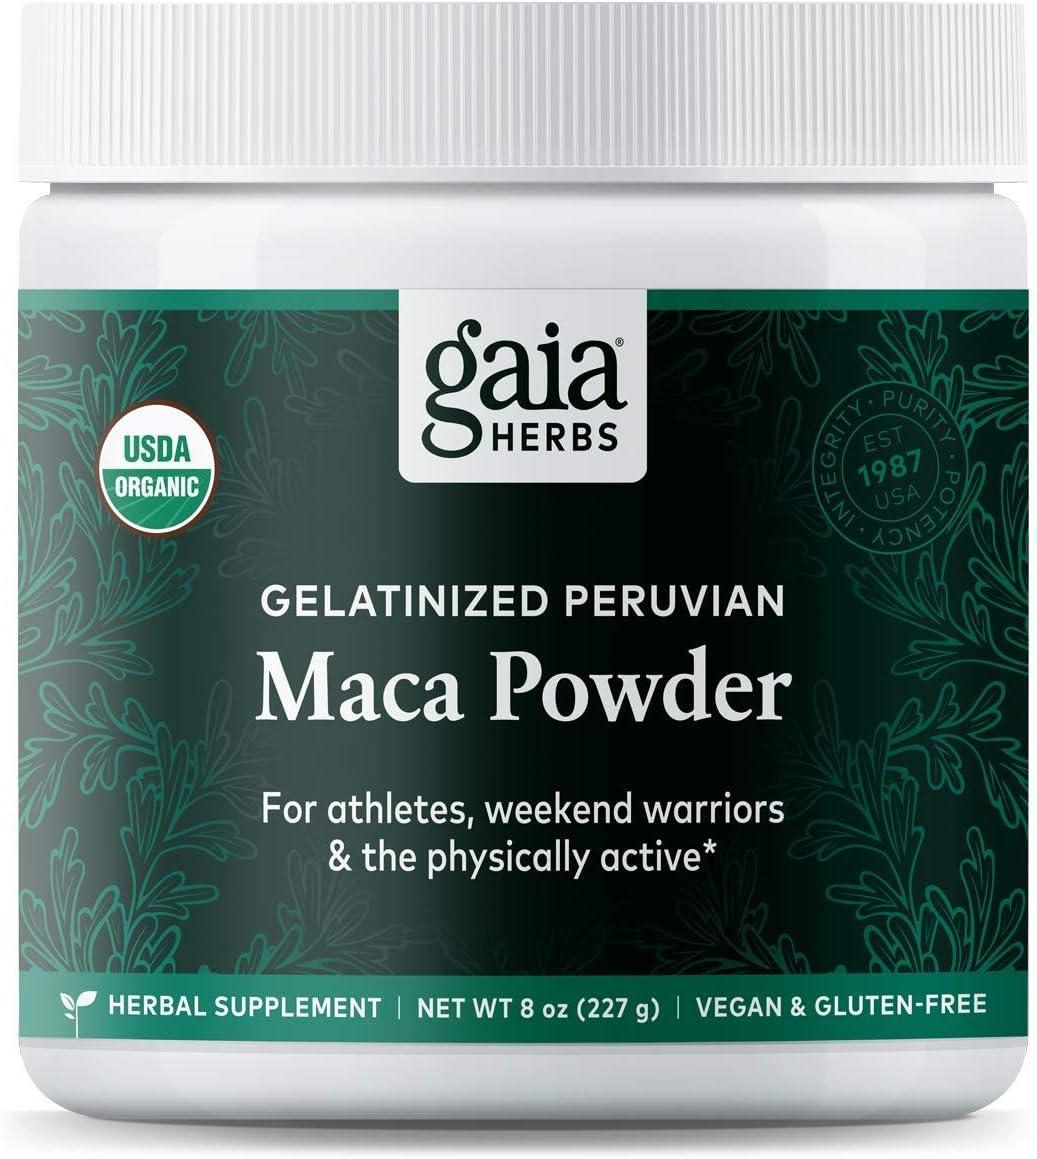 Gaia Herbs Organic Maca Powder, 8 Ounce - Peruvian-Grown Superfood Supports Energy, Stamina, Healthy Libido, Hormone Balance - Gelatinized, Vegan